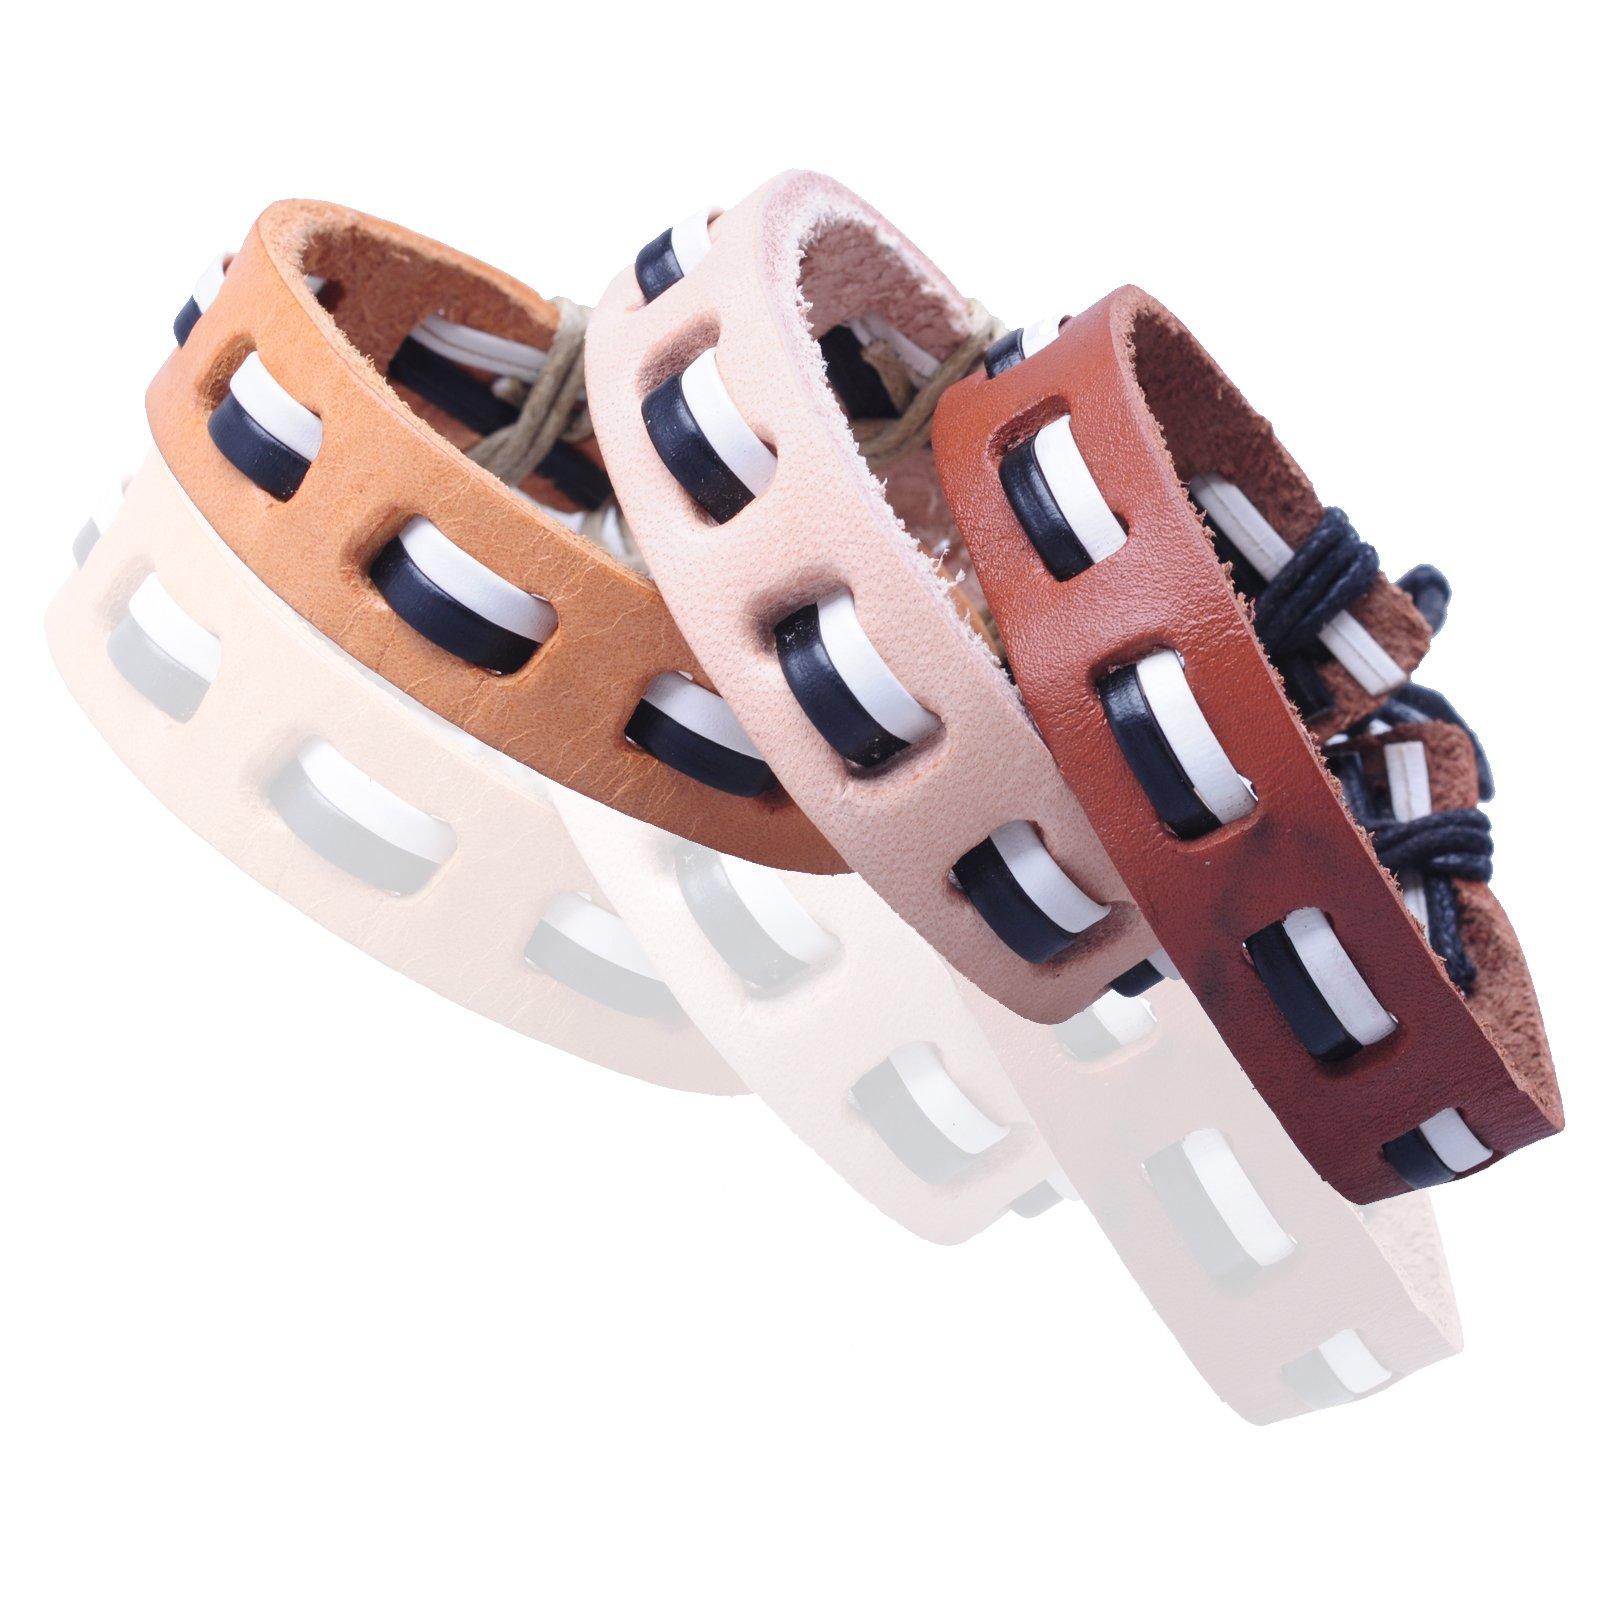 New-Fawn-Orange-Brown-Unisex-Genuine-Leather-Adjustable-Bracelets-Gift-086USANNA miniature 18